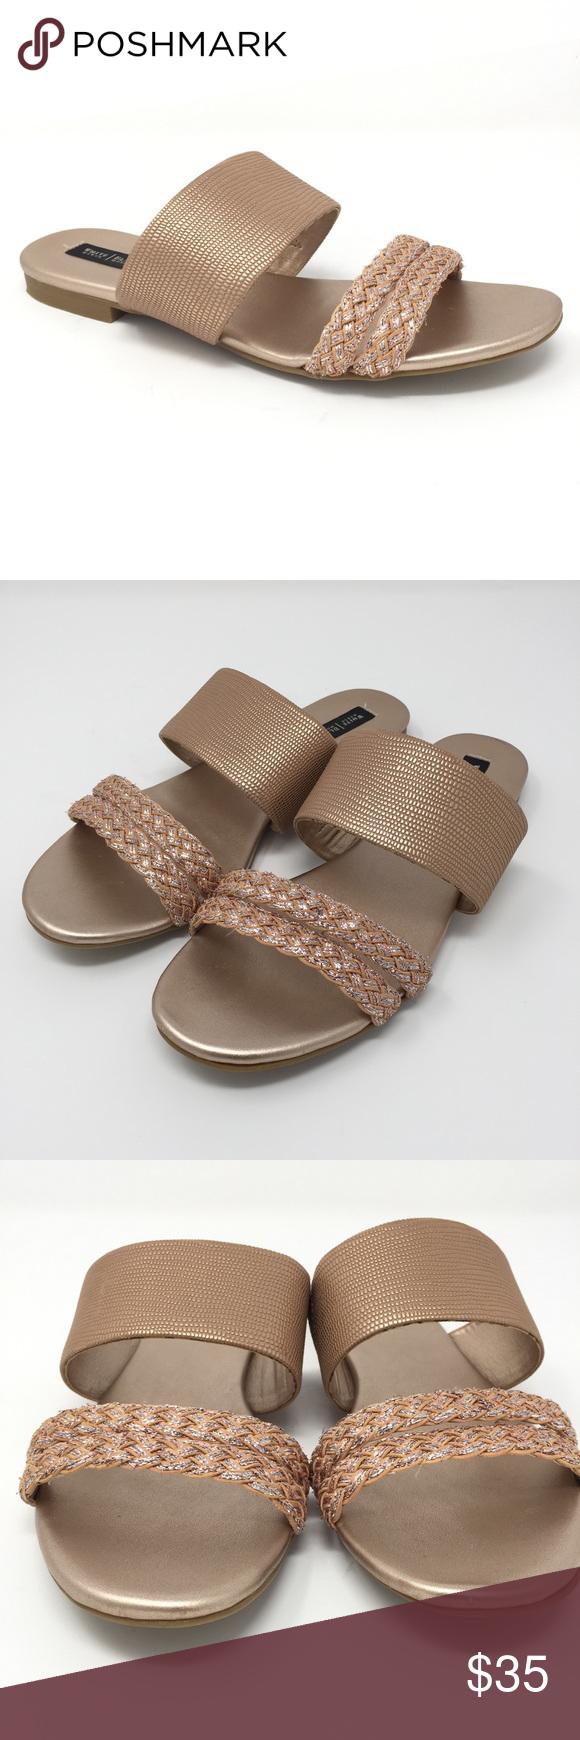 a0766341e20b 7.5 WHBM rose gold pixie metallic sandals White House Black Market size 7.5  pixie slip on